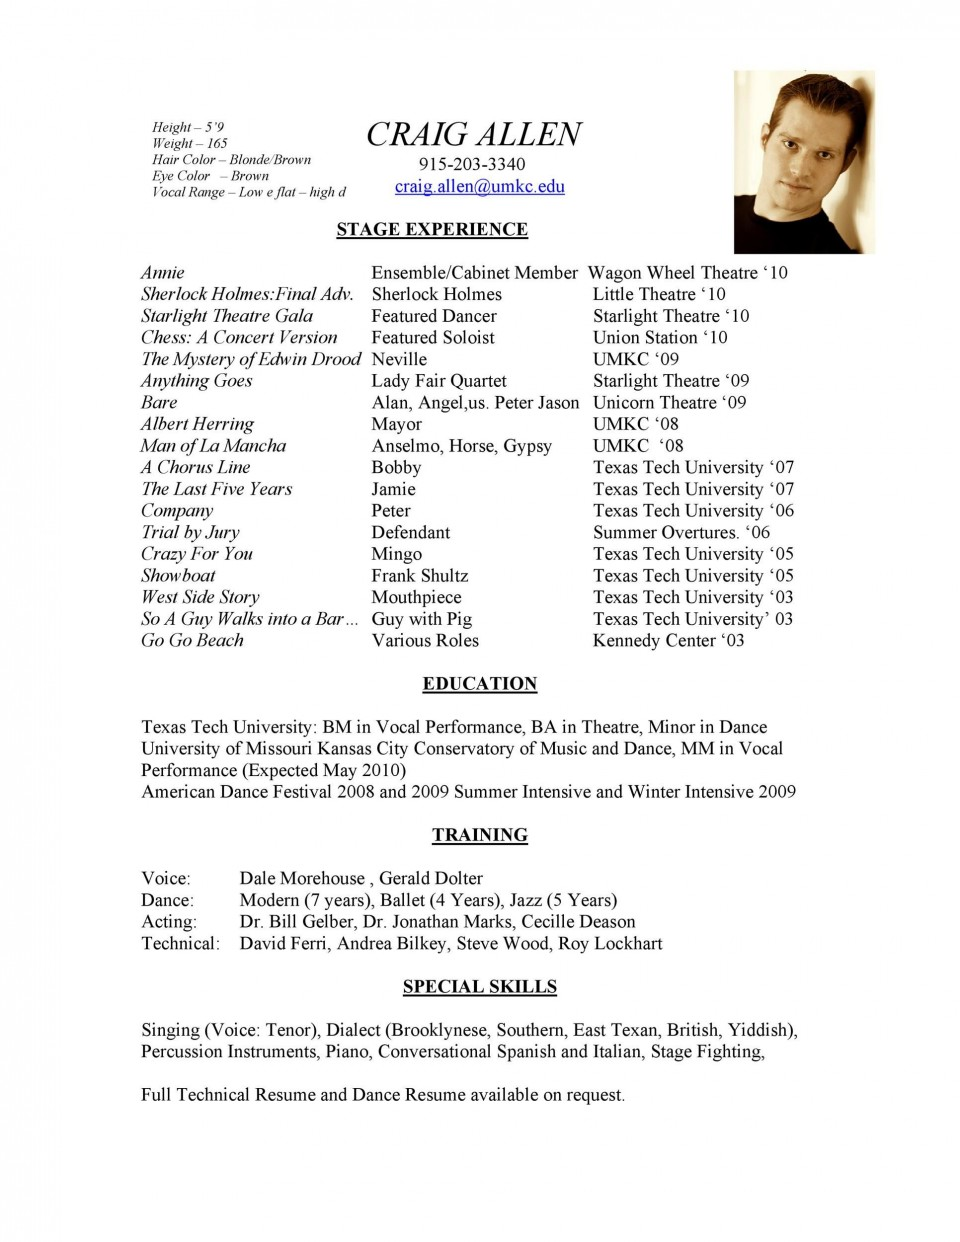 004 Beautiful Technical Theatre Resume Template High Resolution  Google Doc Tech960